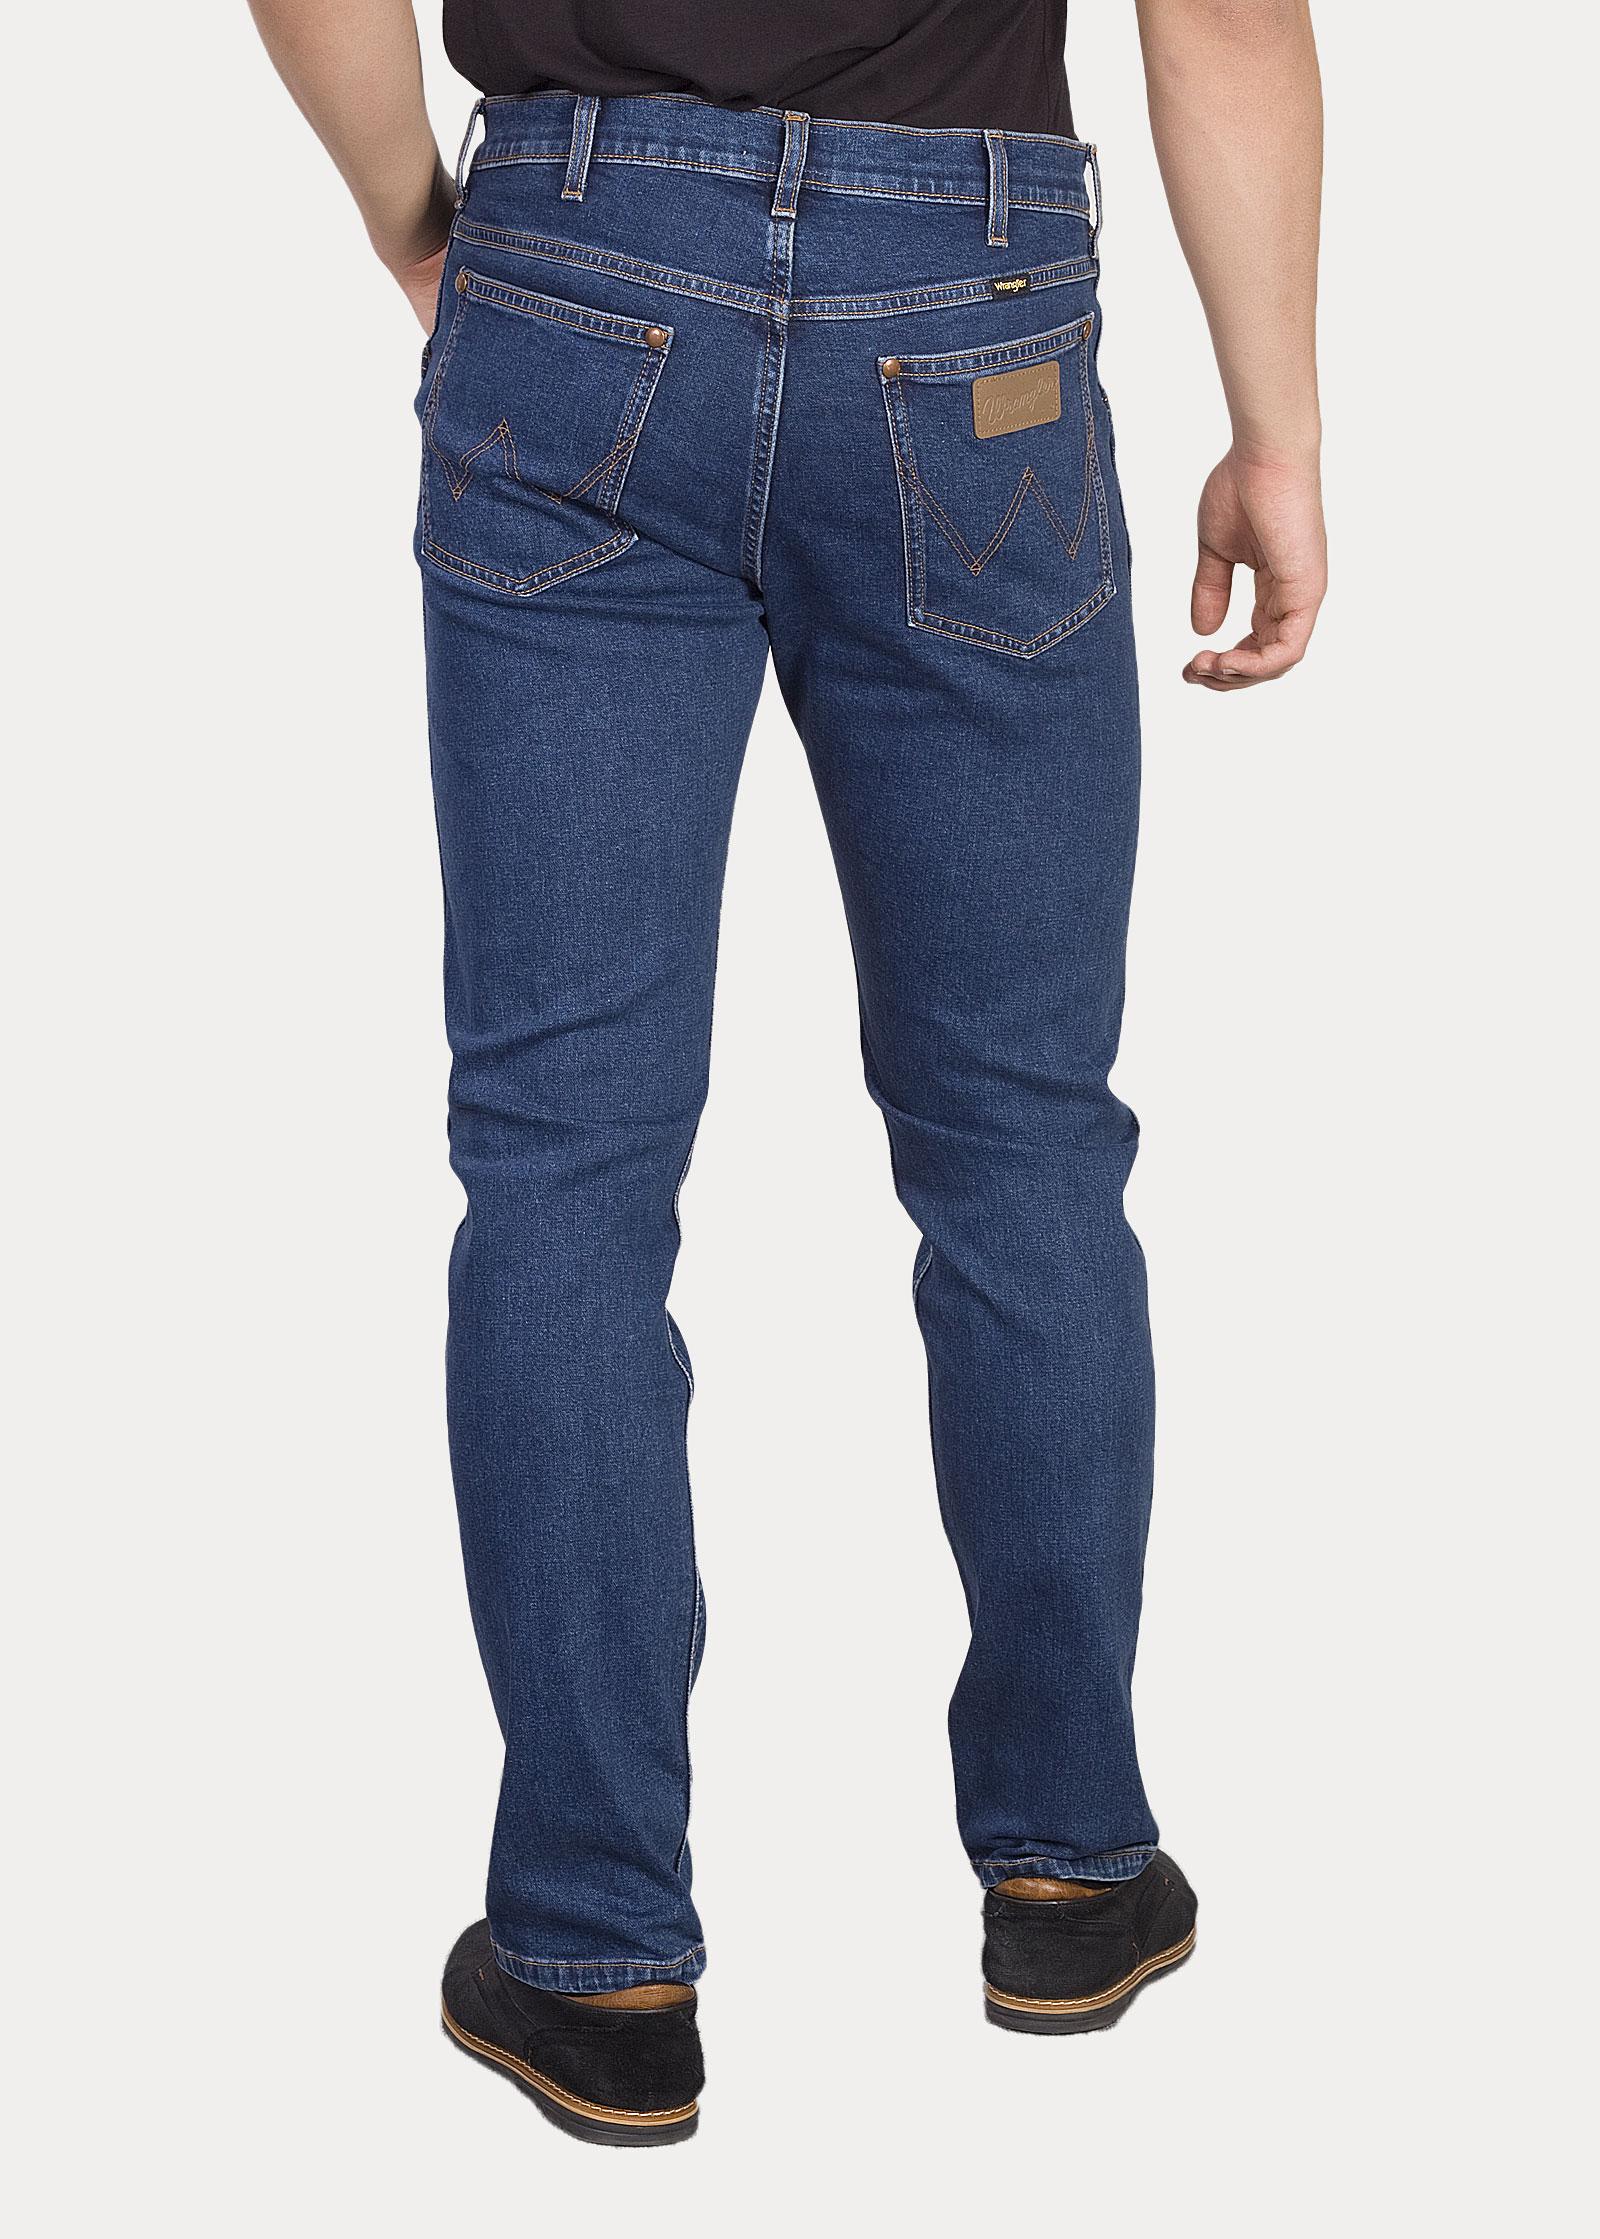 Men S Jeans Wrangler Icons 11mwz Western Slim Jeans 6 Months W1mzuh923 Blue